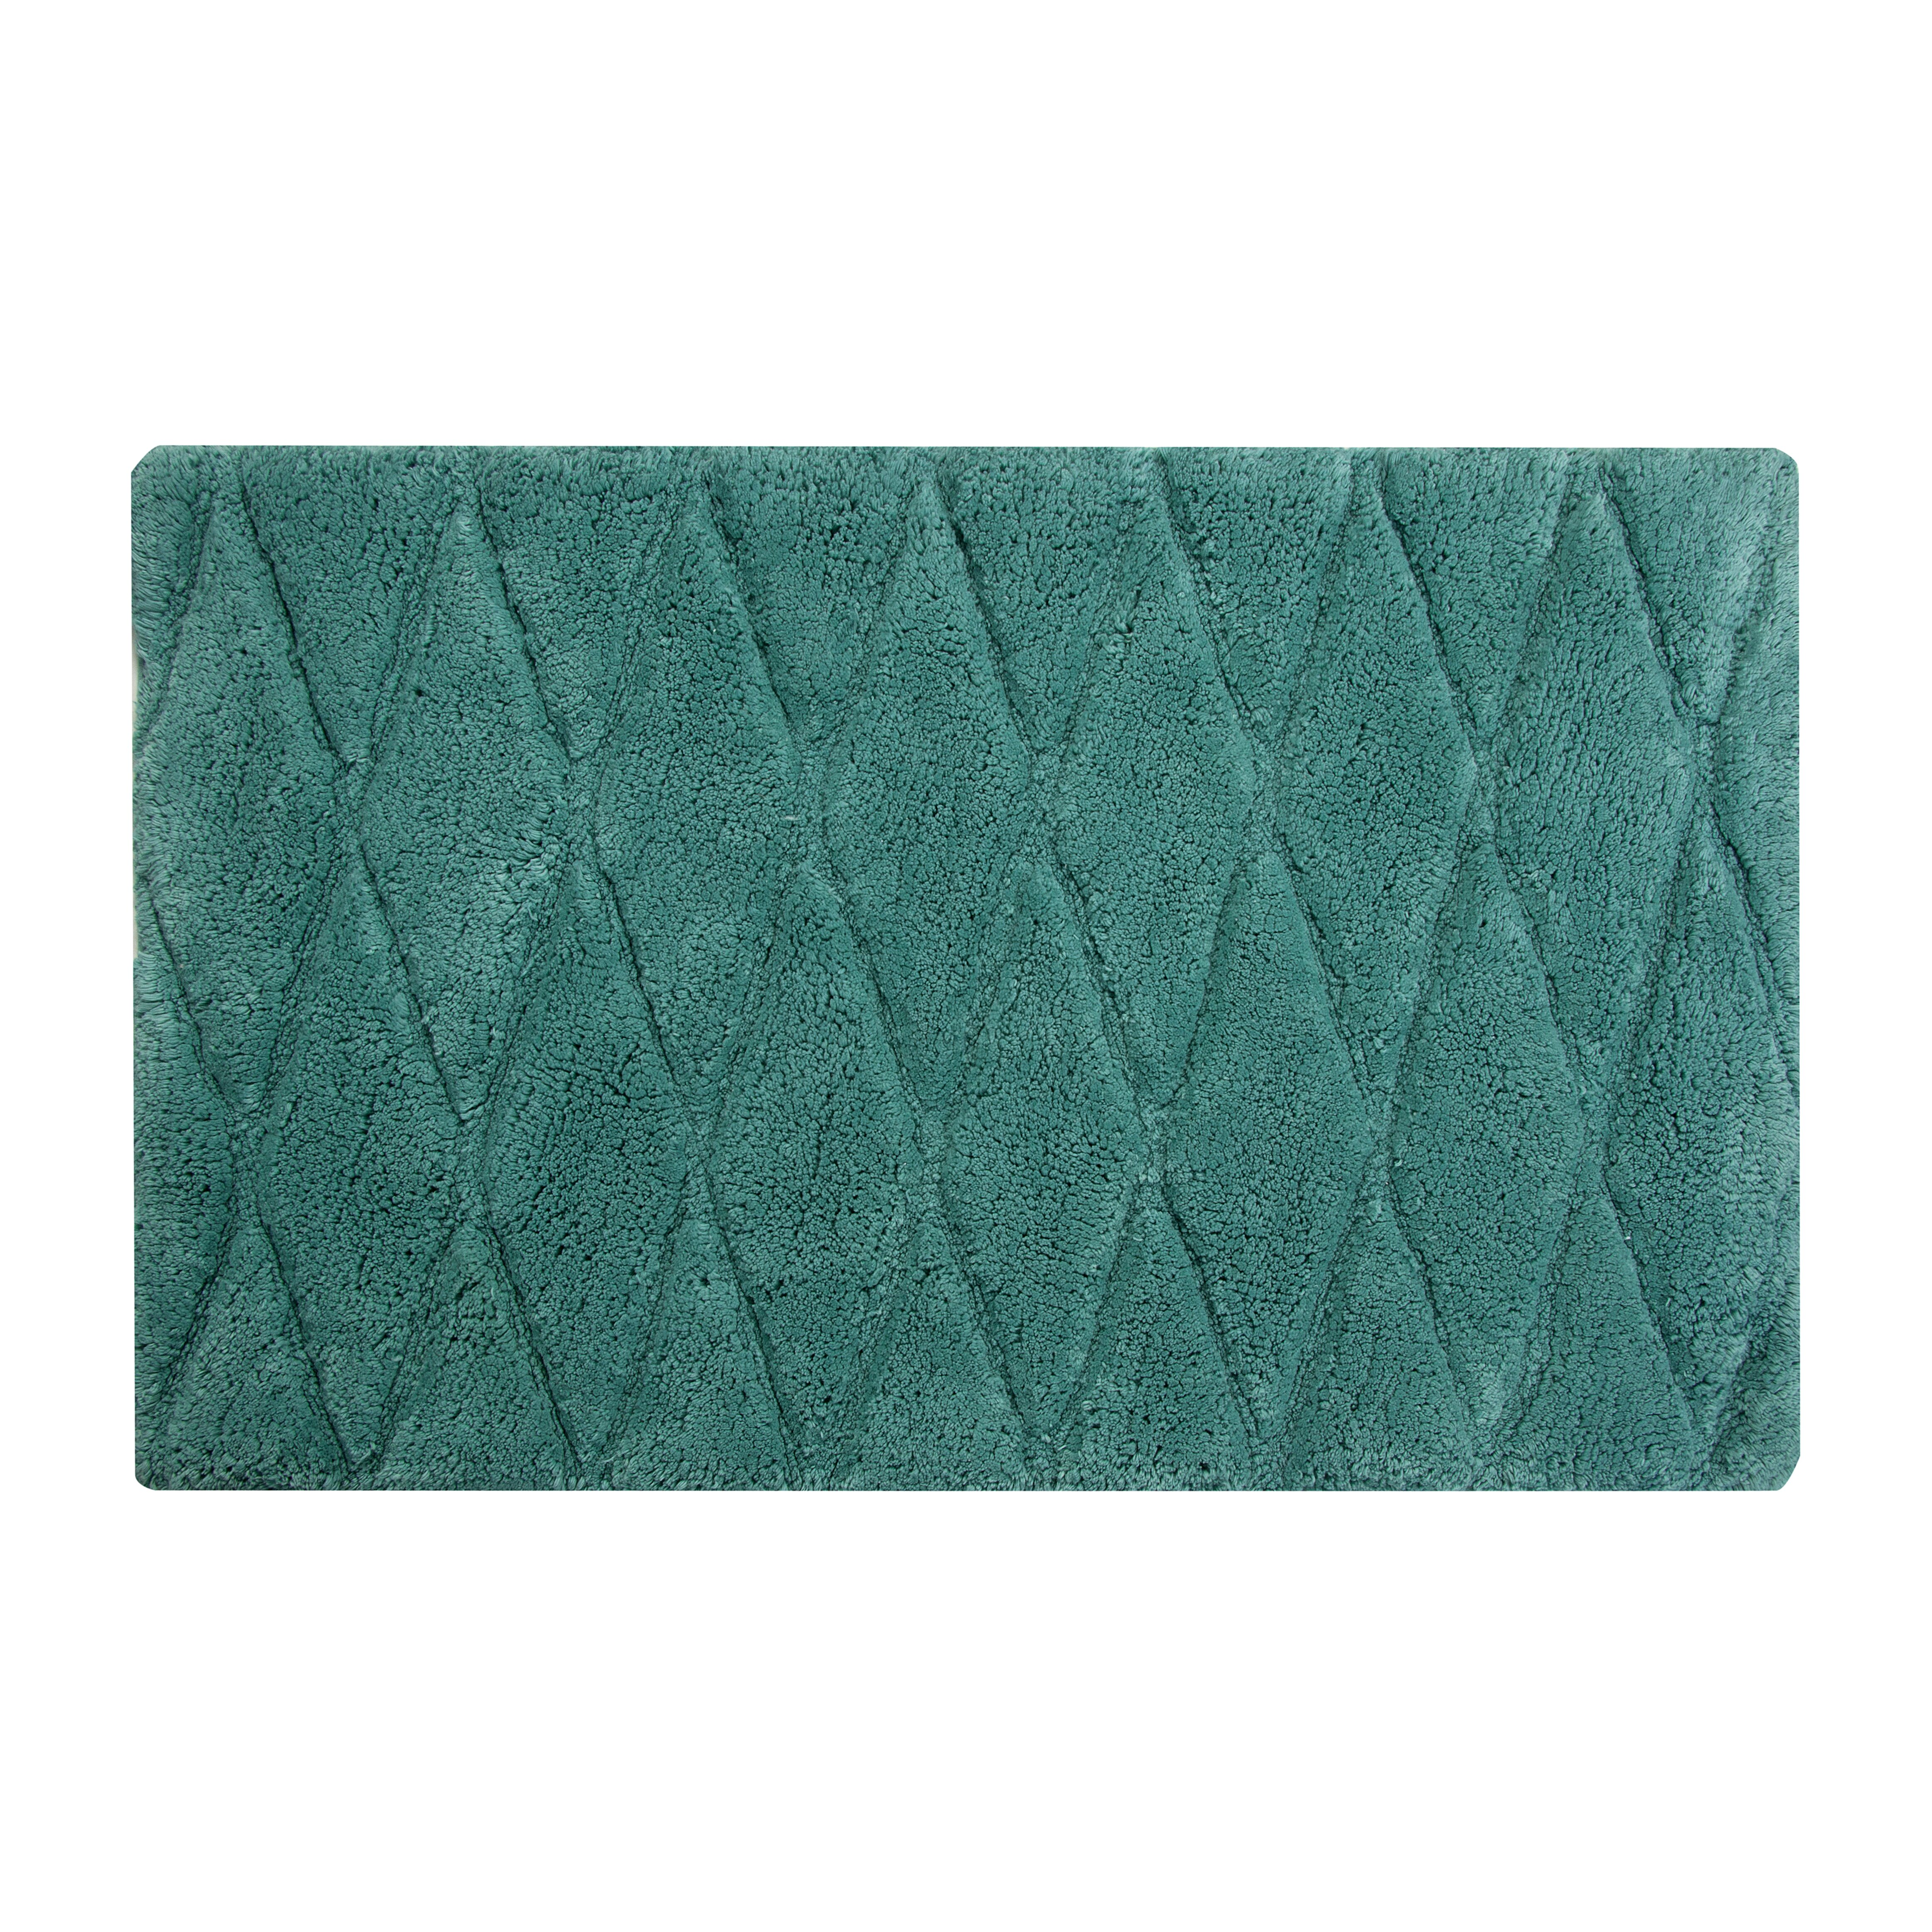 Bathroom rug sets on sale luxury bath rug http for Bathroom sets on sale